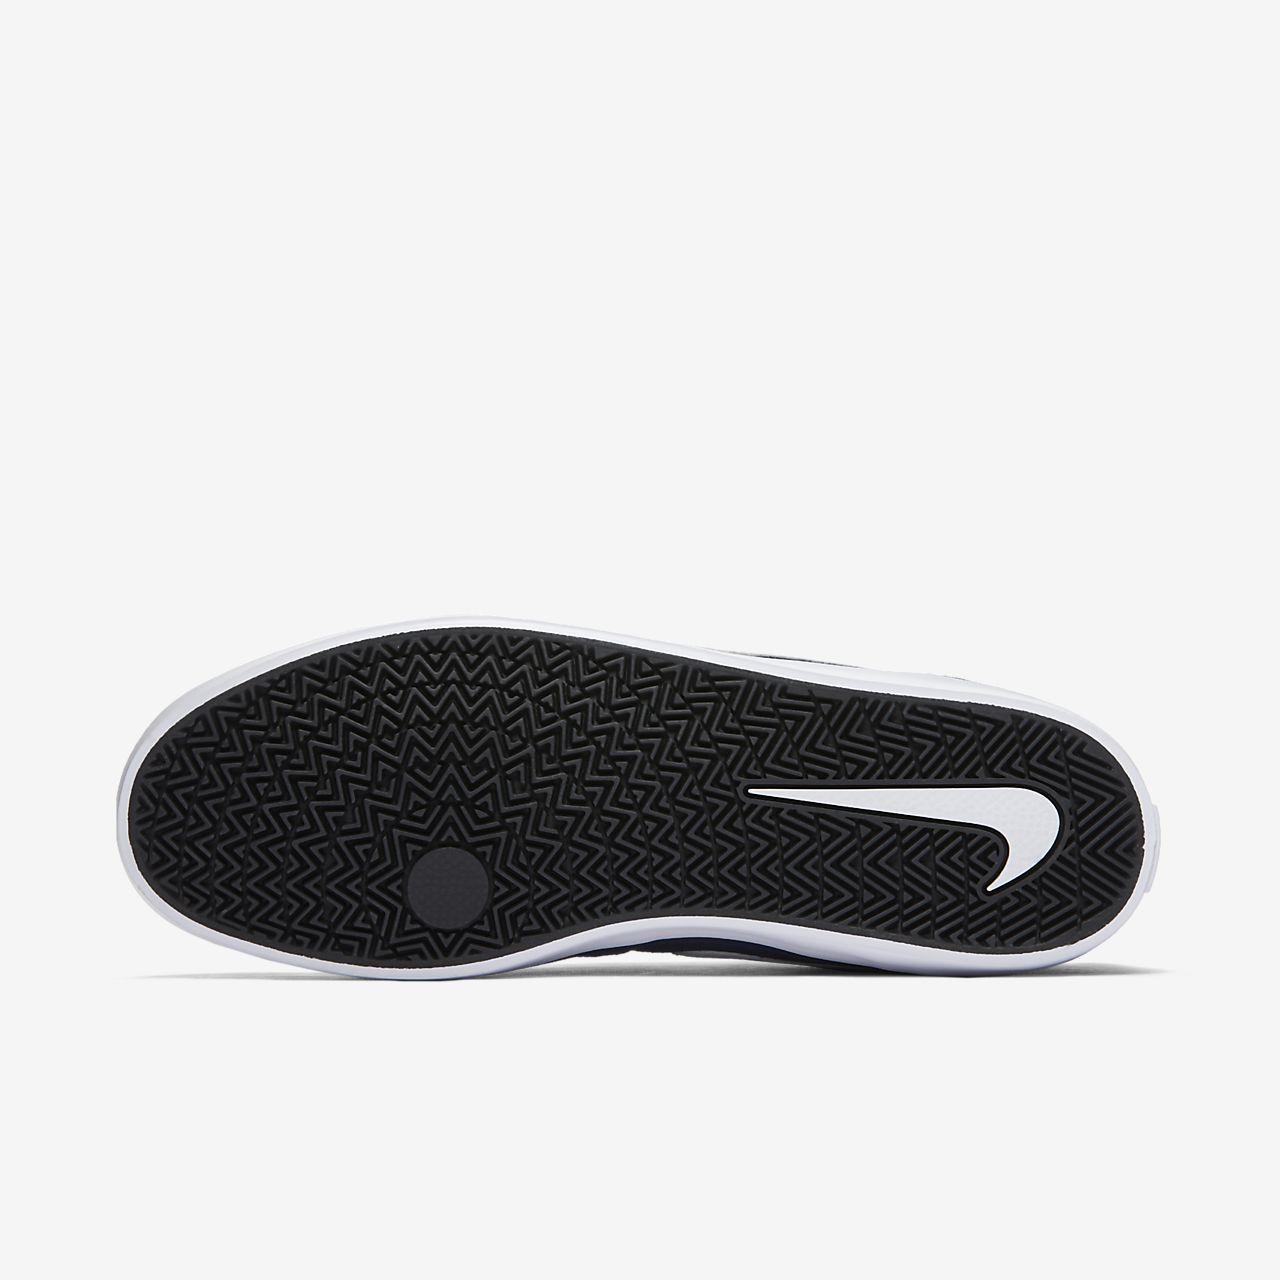 Chaussure de skateboard Nike SB Check Solarsoft pour Homme